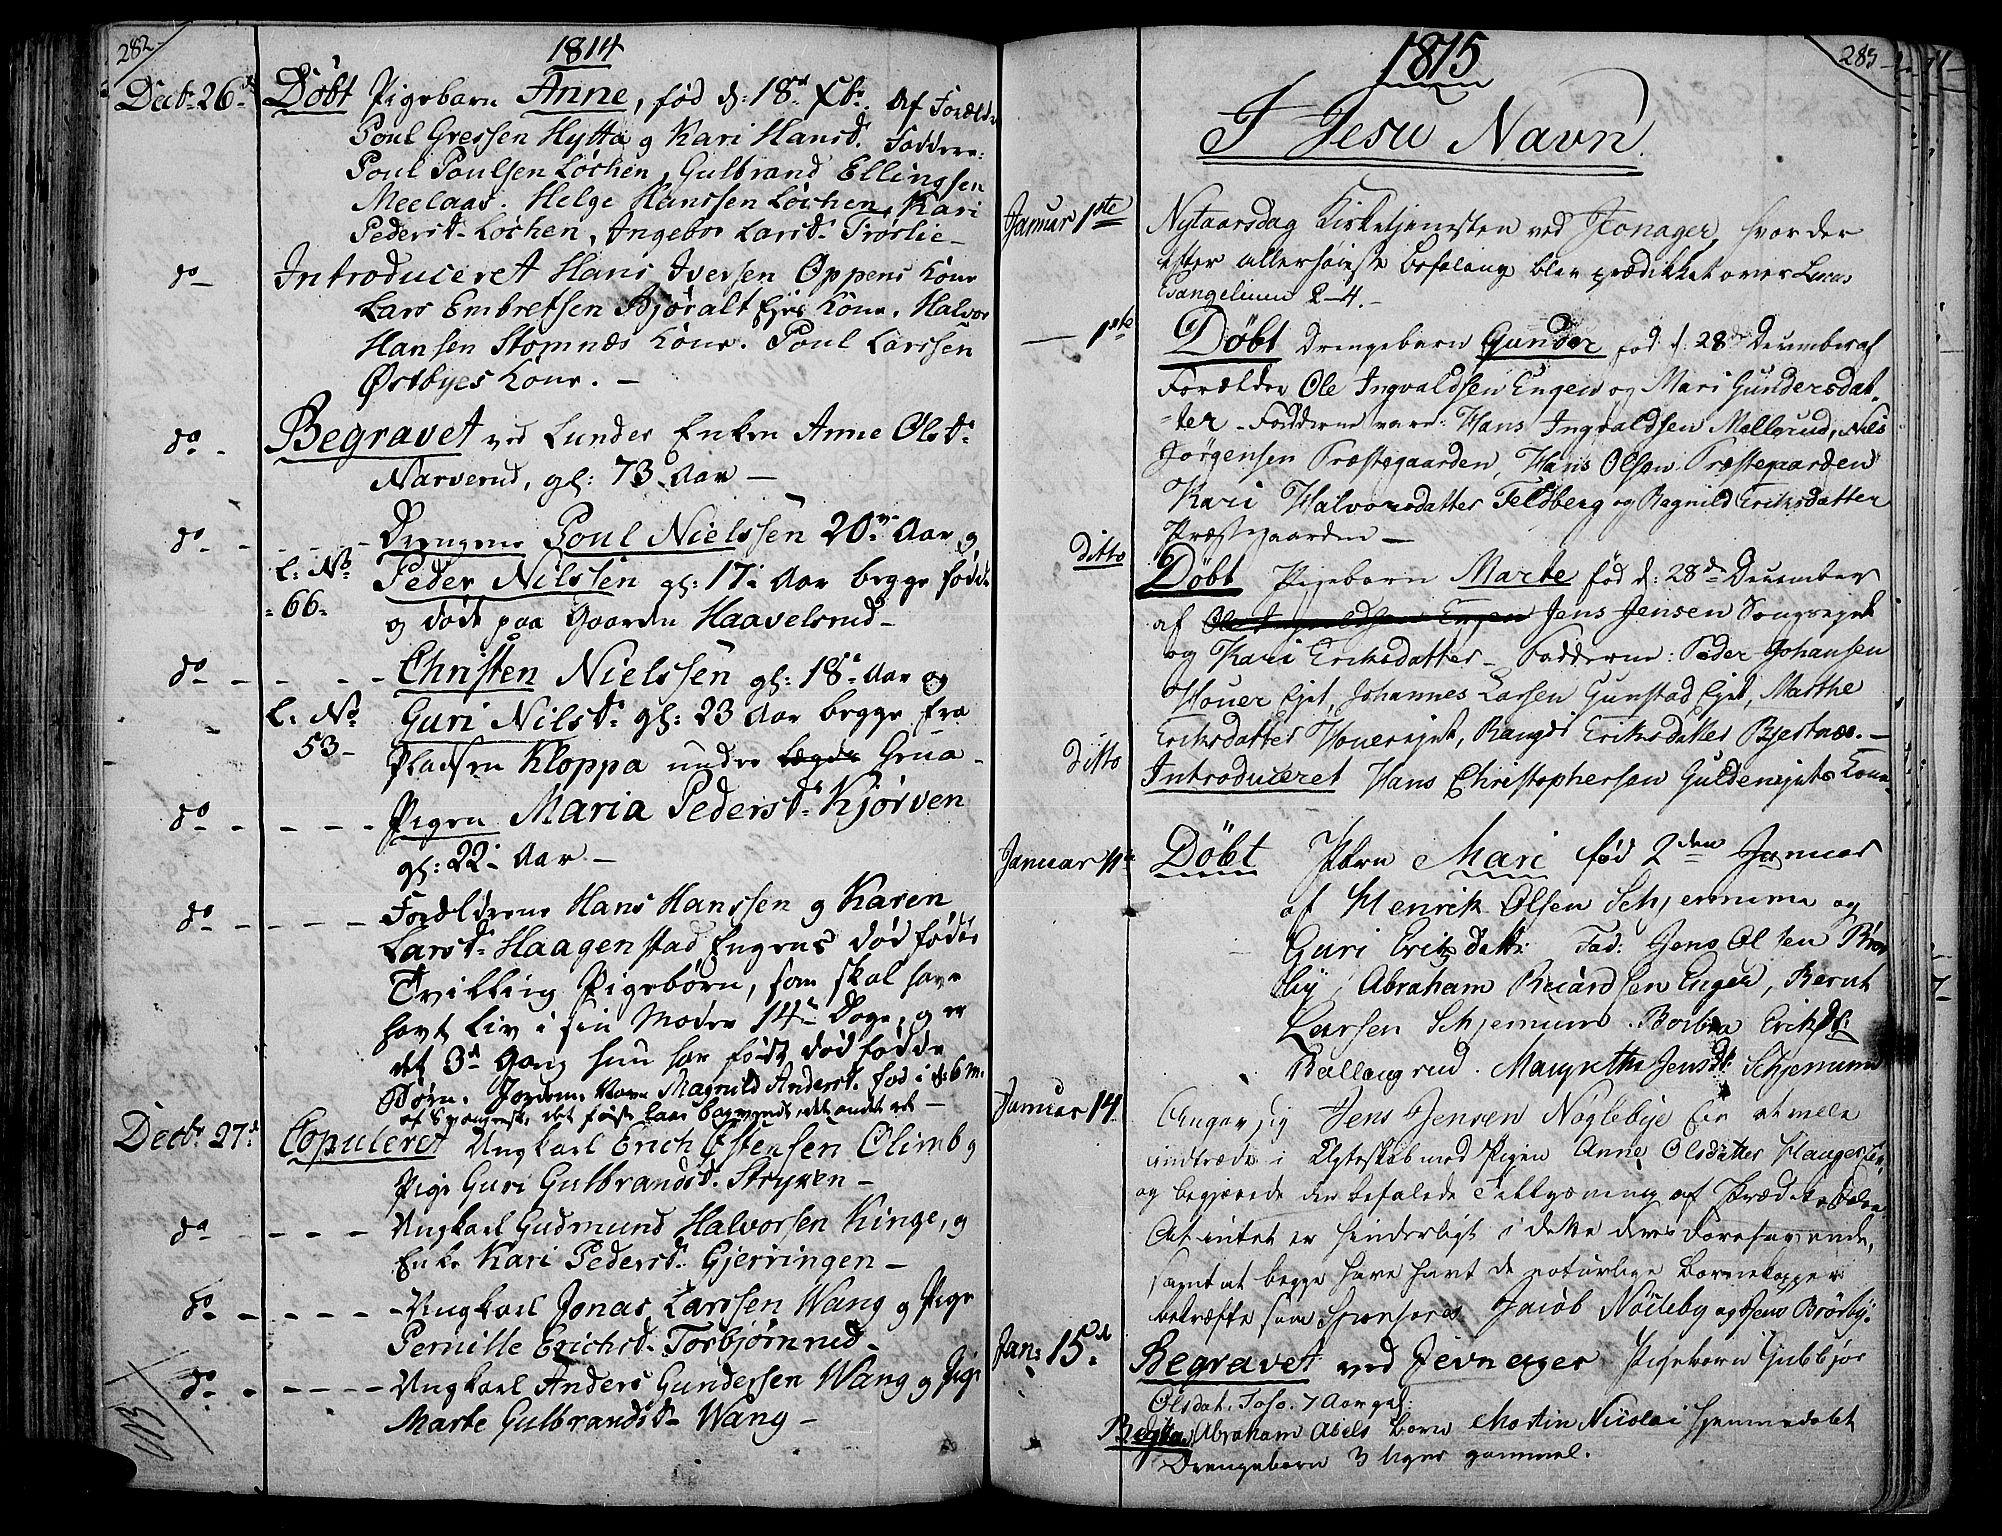 SAH, Jevnaker prestekontor, Ministerialbok nr. 4, 1800-1861, s. 282-283